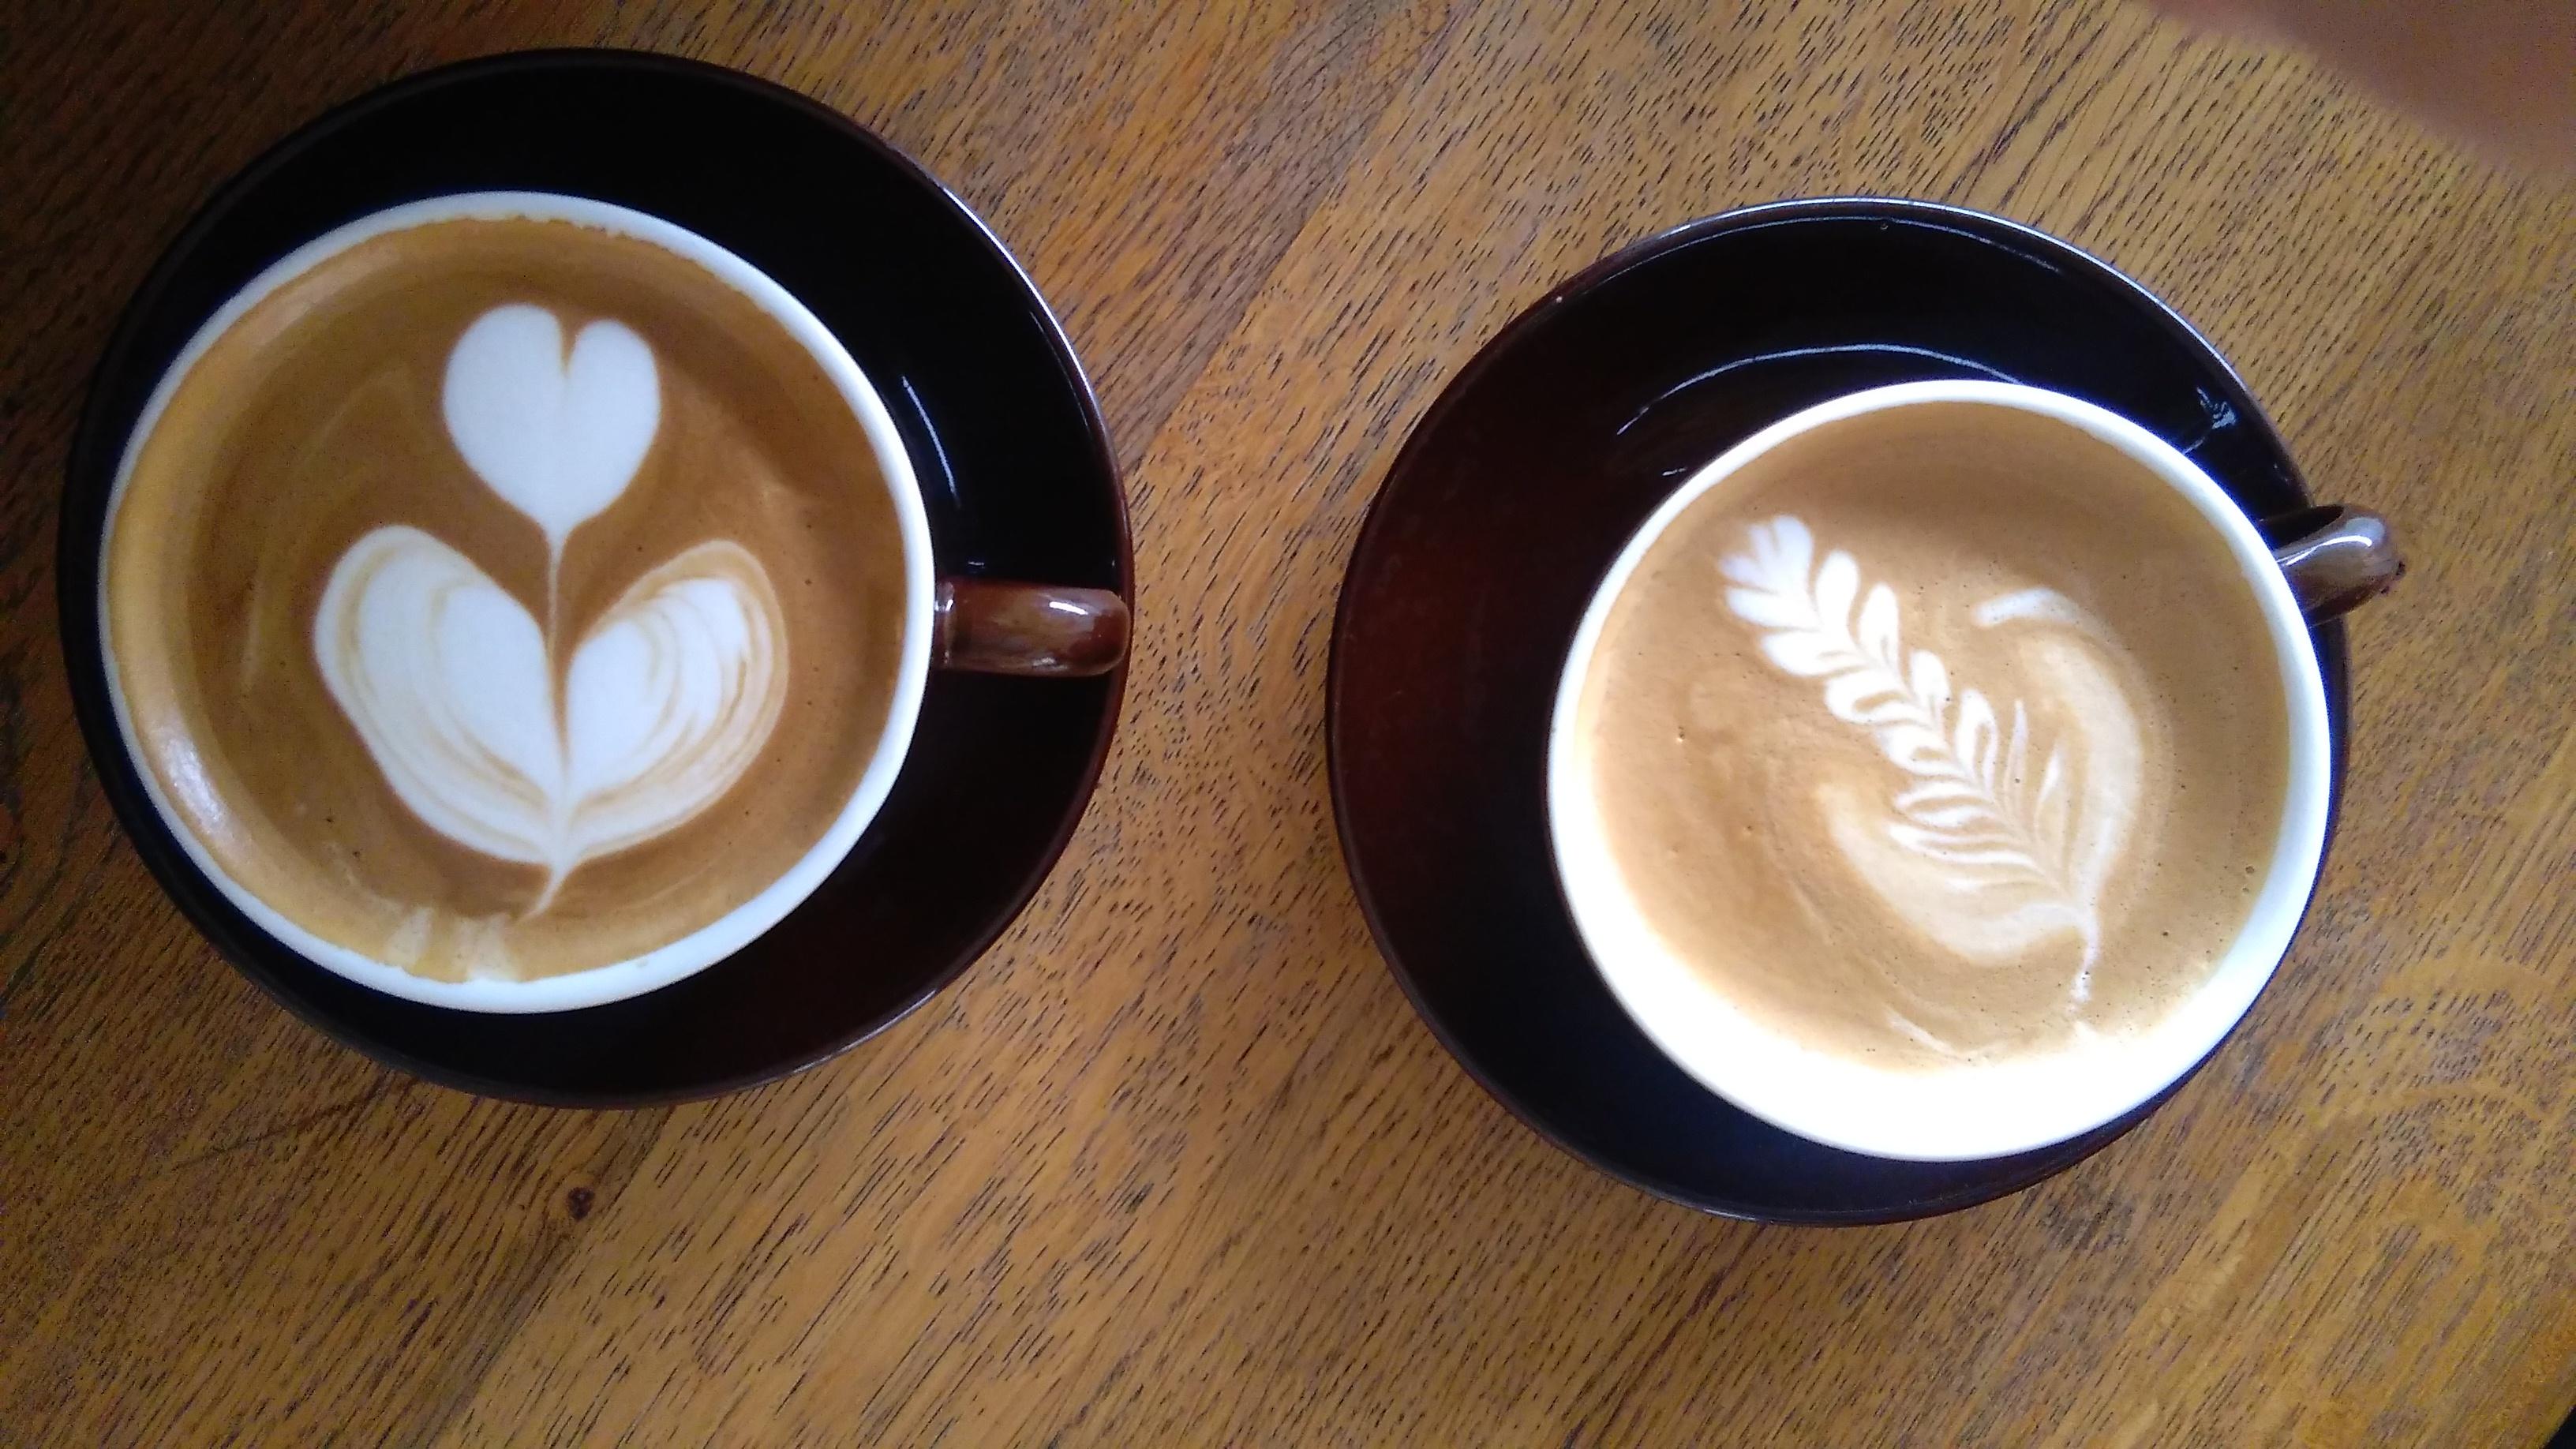 dusseldorf koffiebar museum koffie cappuccino